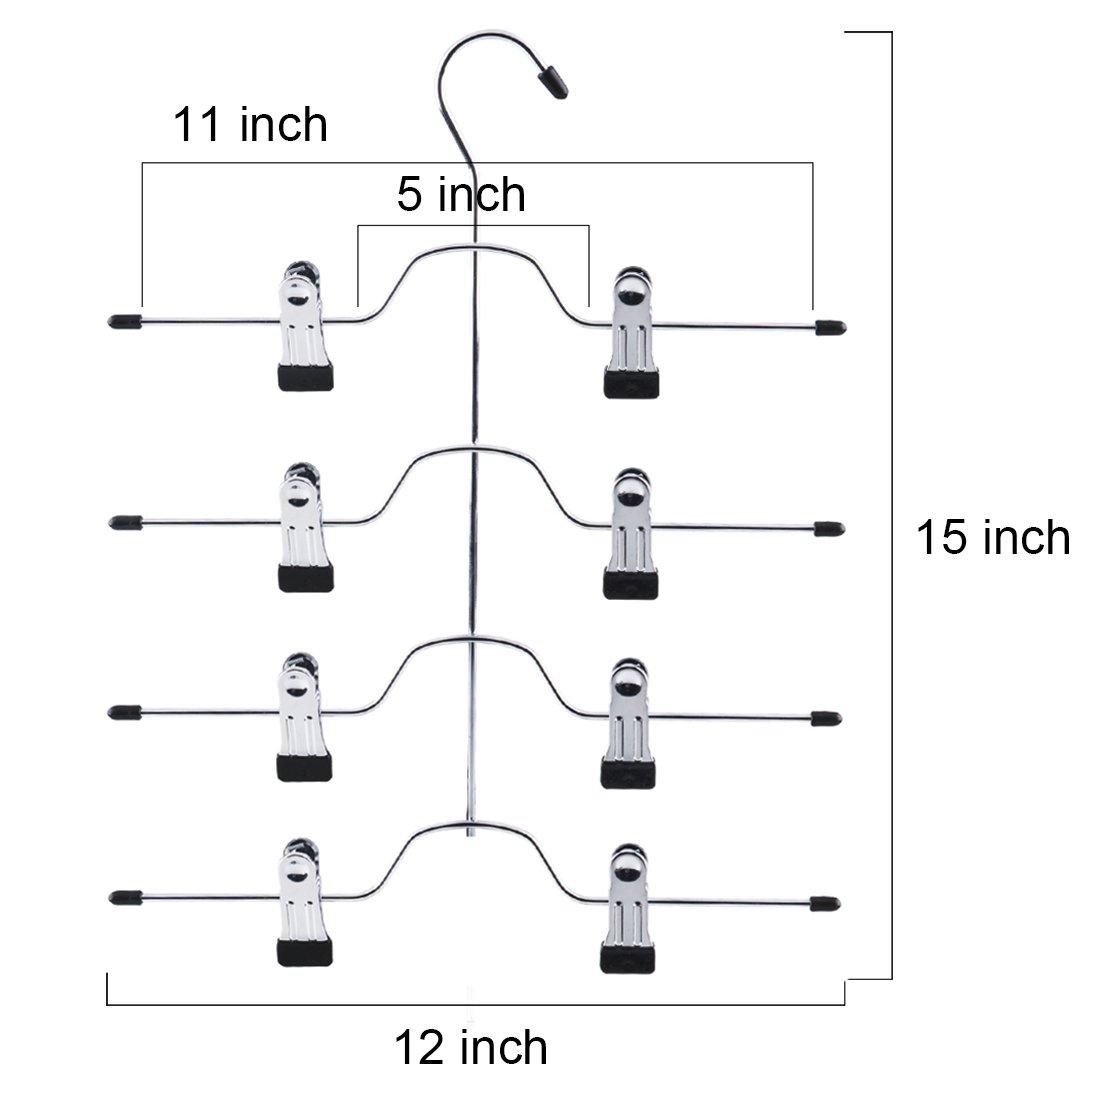 Tosnail 4 Pack 4 Tier Trouser Skirt Hanger - Non Slip Black Vinyl Clips Great Space Saver Your Closet by Tosnail (Image #3)